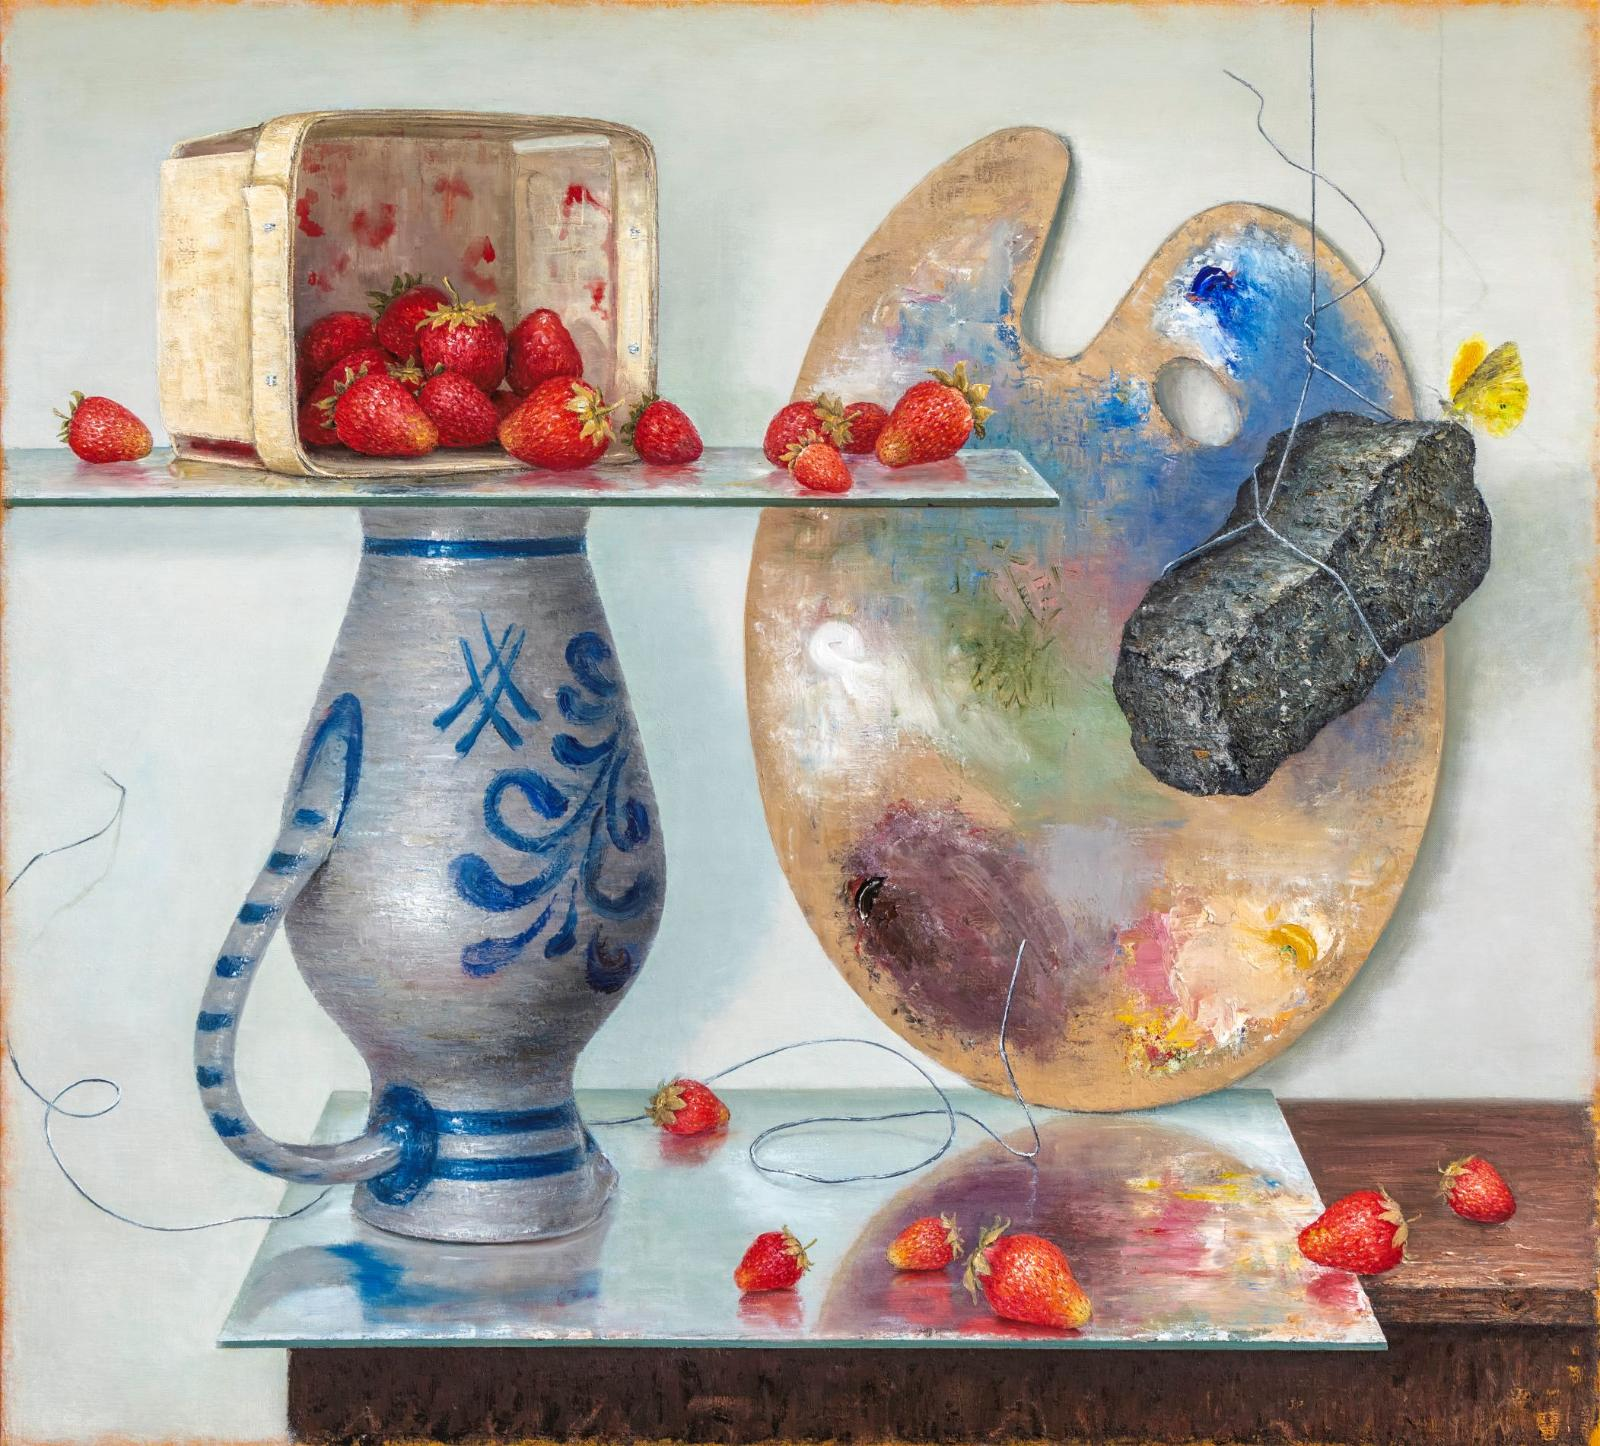 Mirko Schallenberg, Morphe, 2019, Öl auf Leinwand, 146 cm × 160 cm